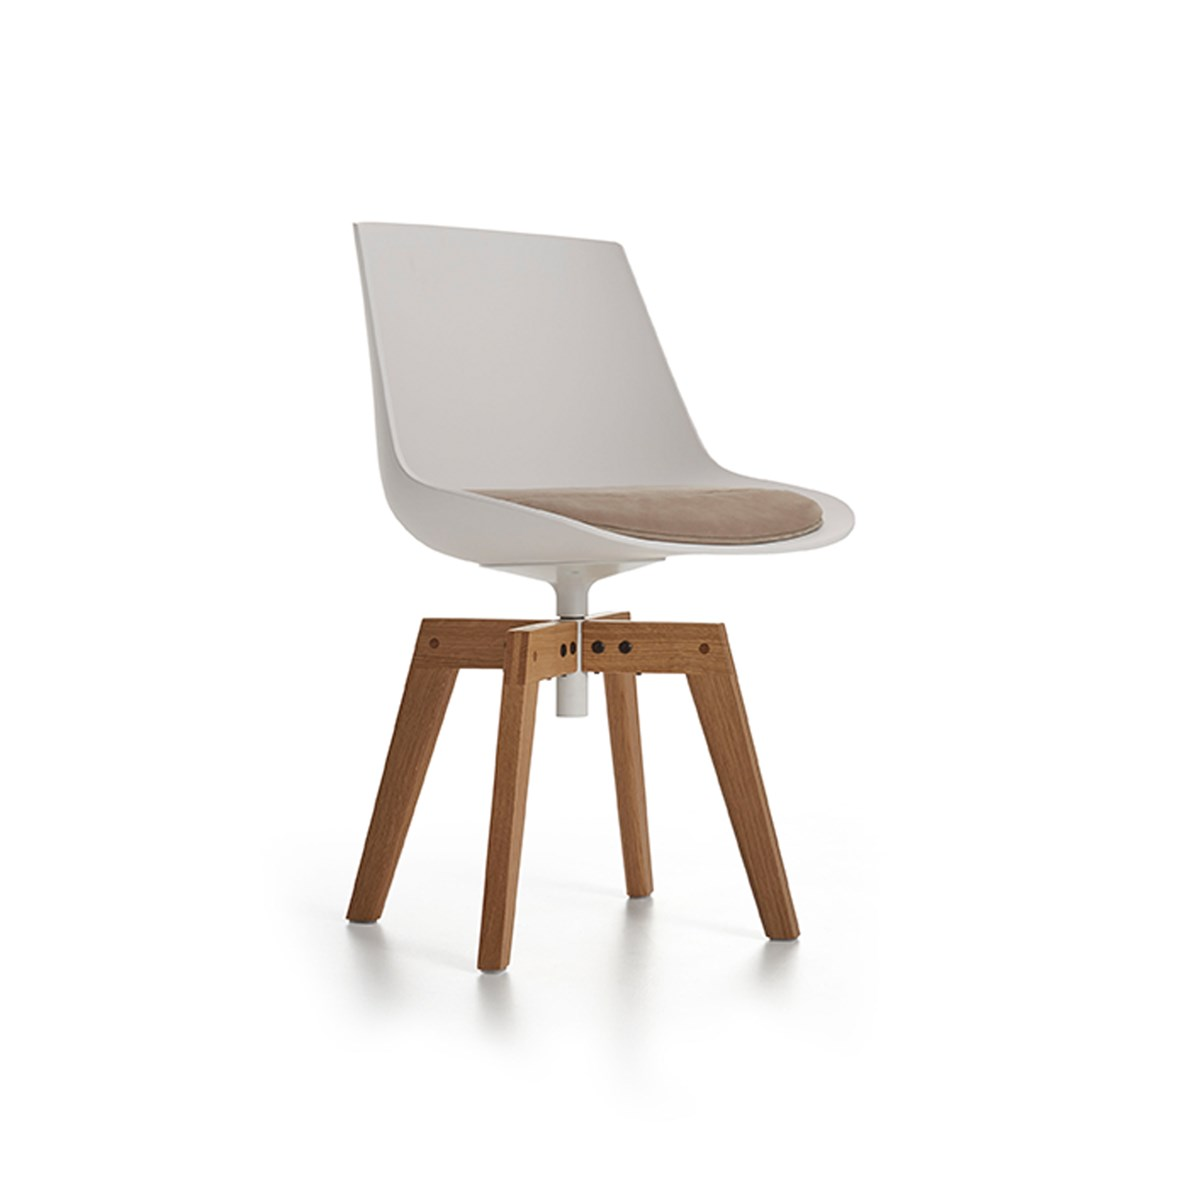 MDF-Italia-Jean-Marie-Massaud-Flow-Chairs-Matisse-1